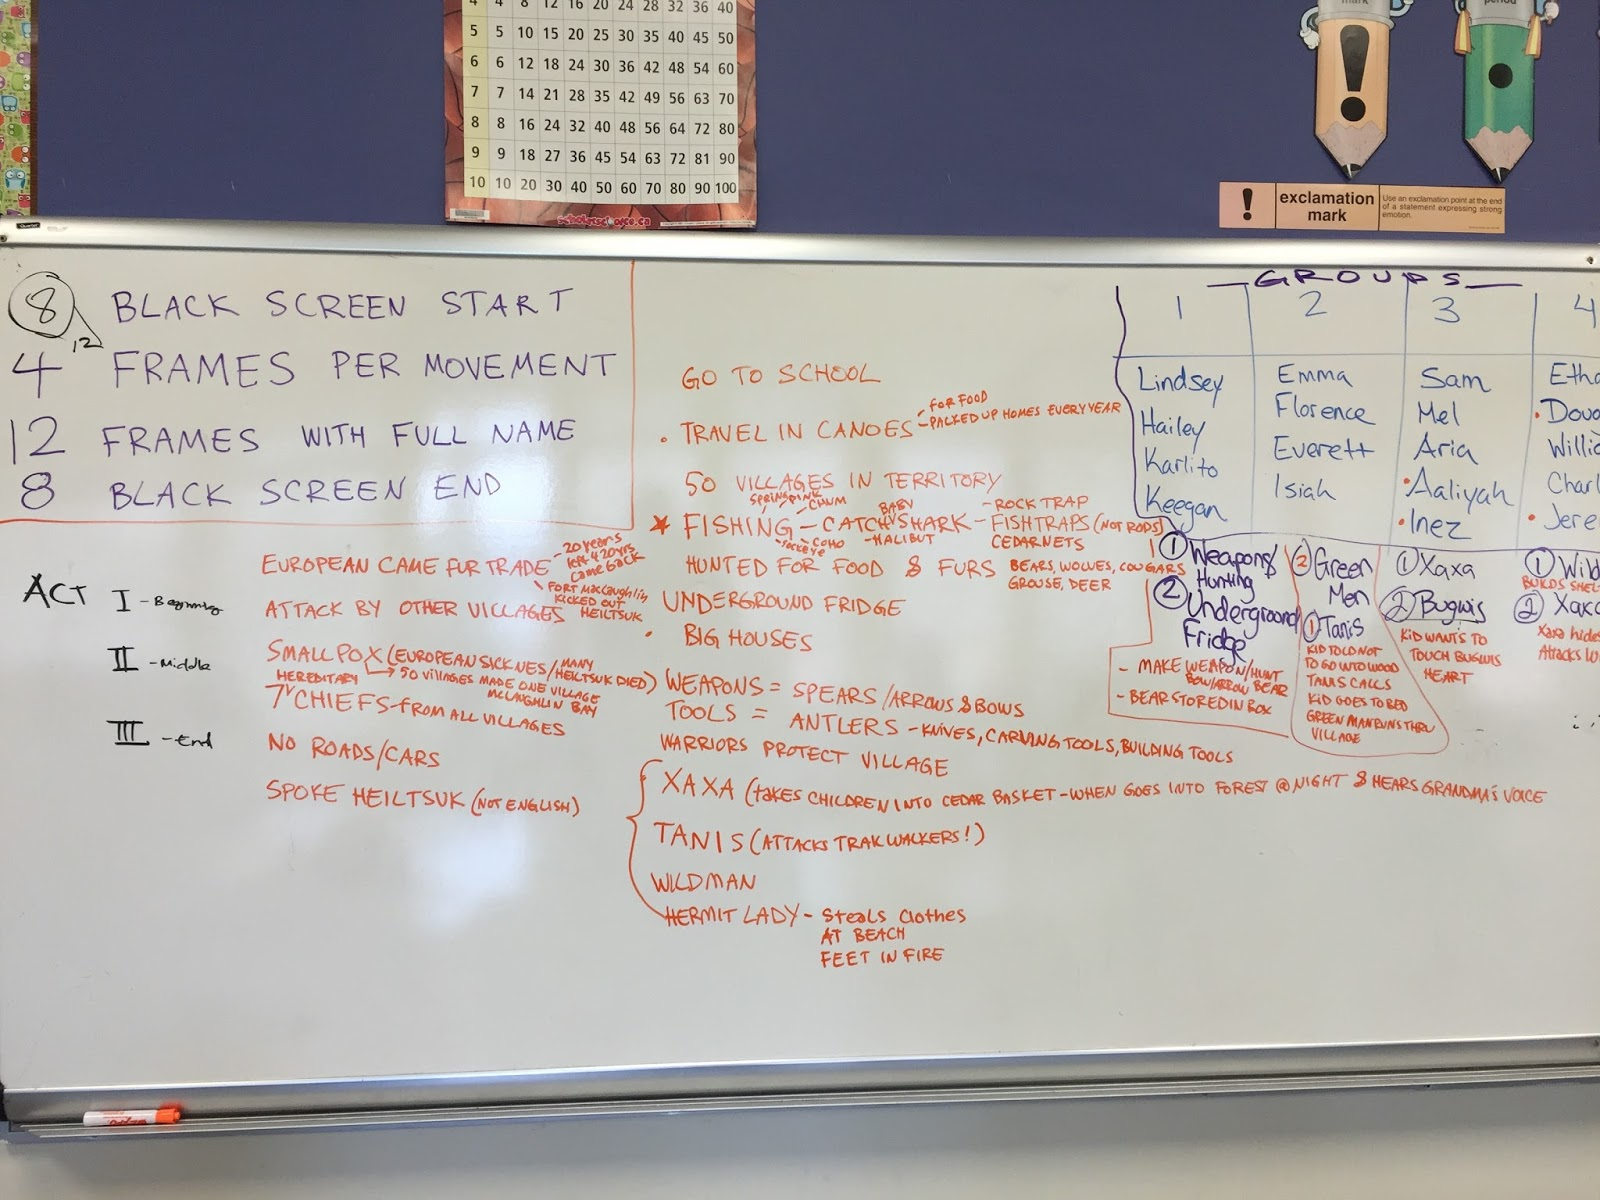 Brainstorming THEMES